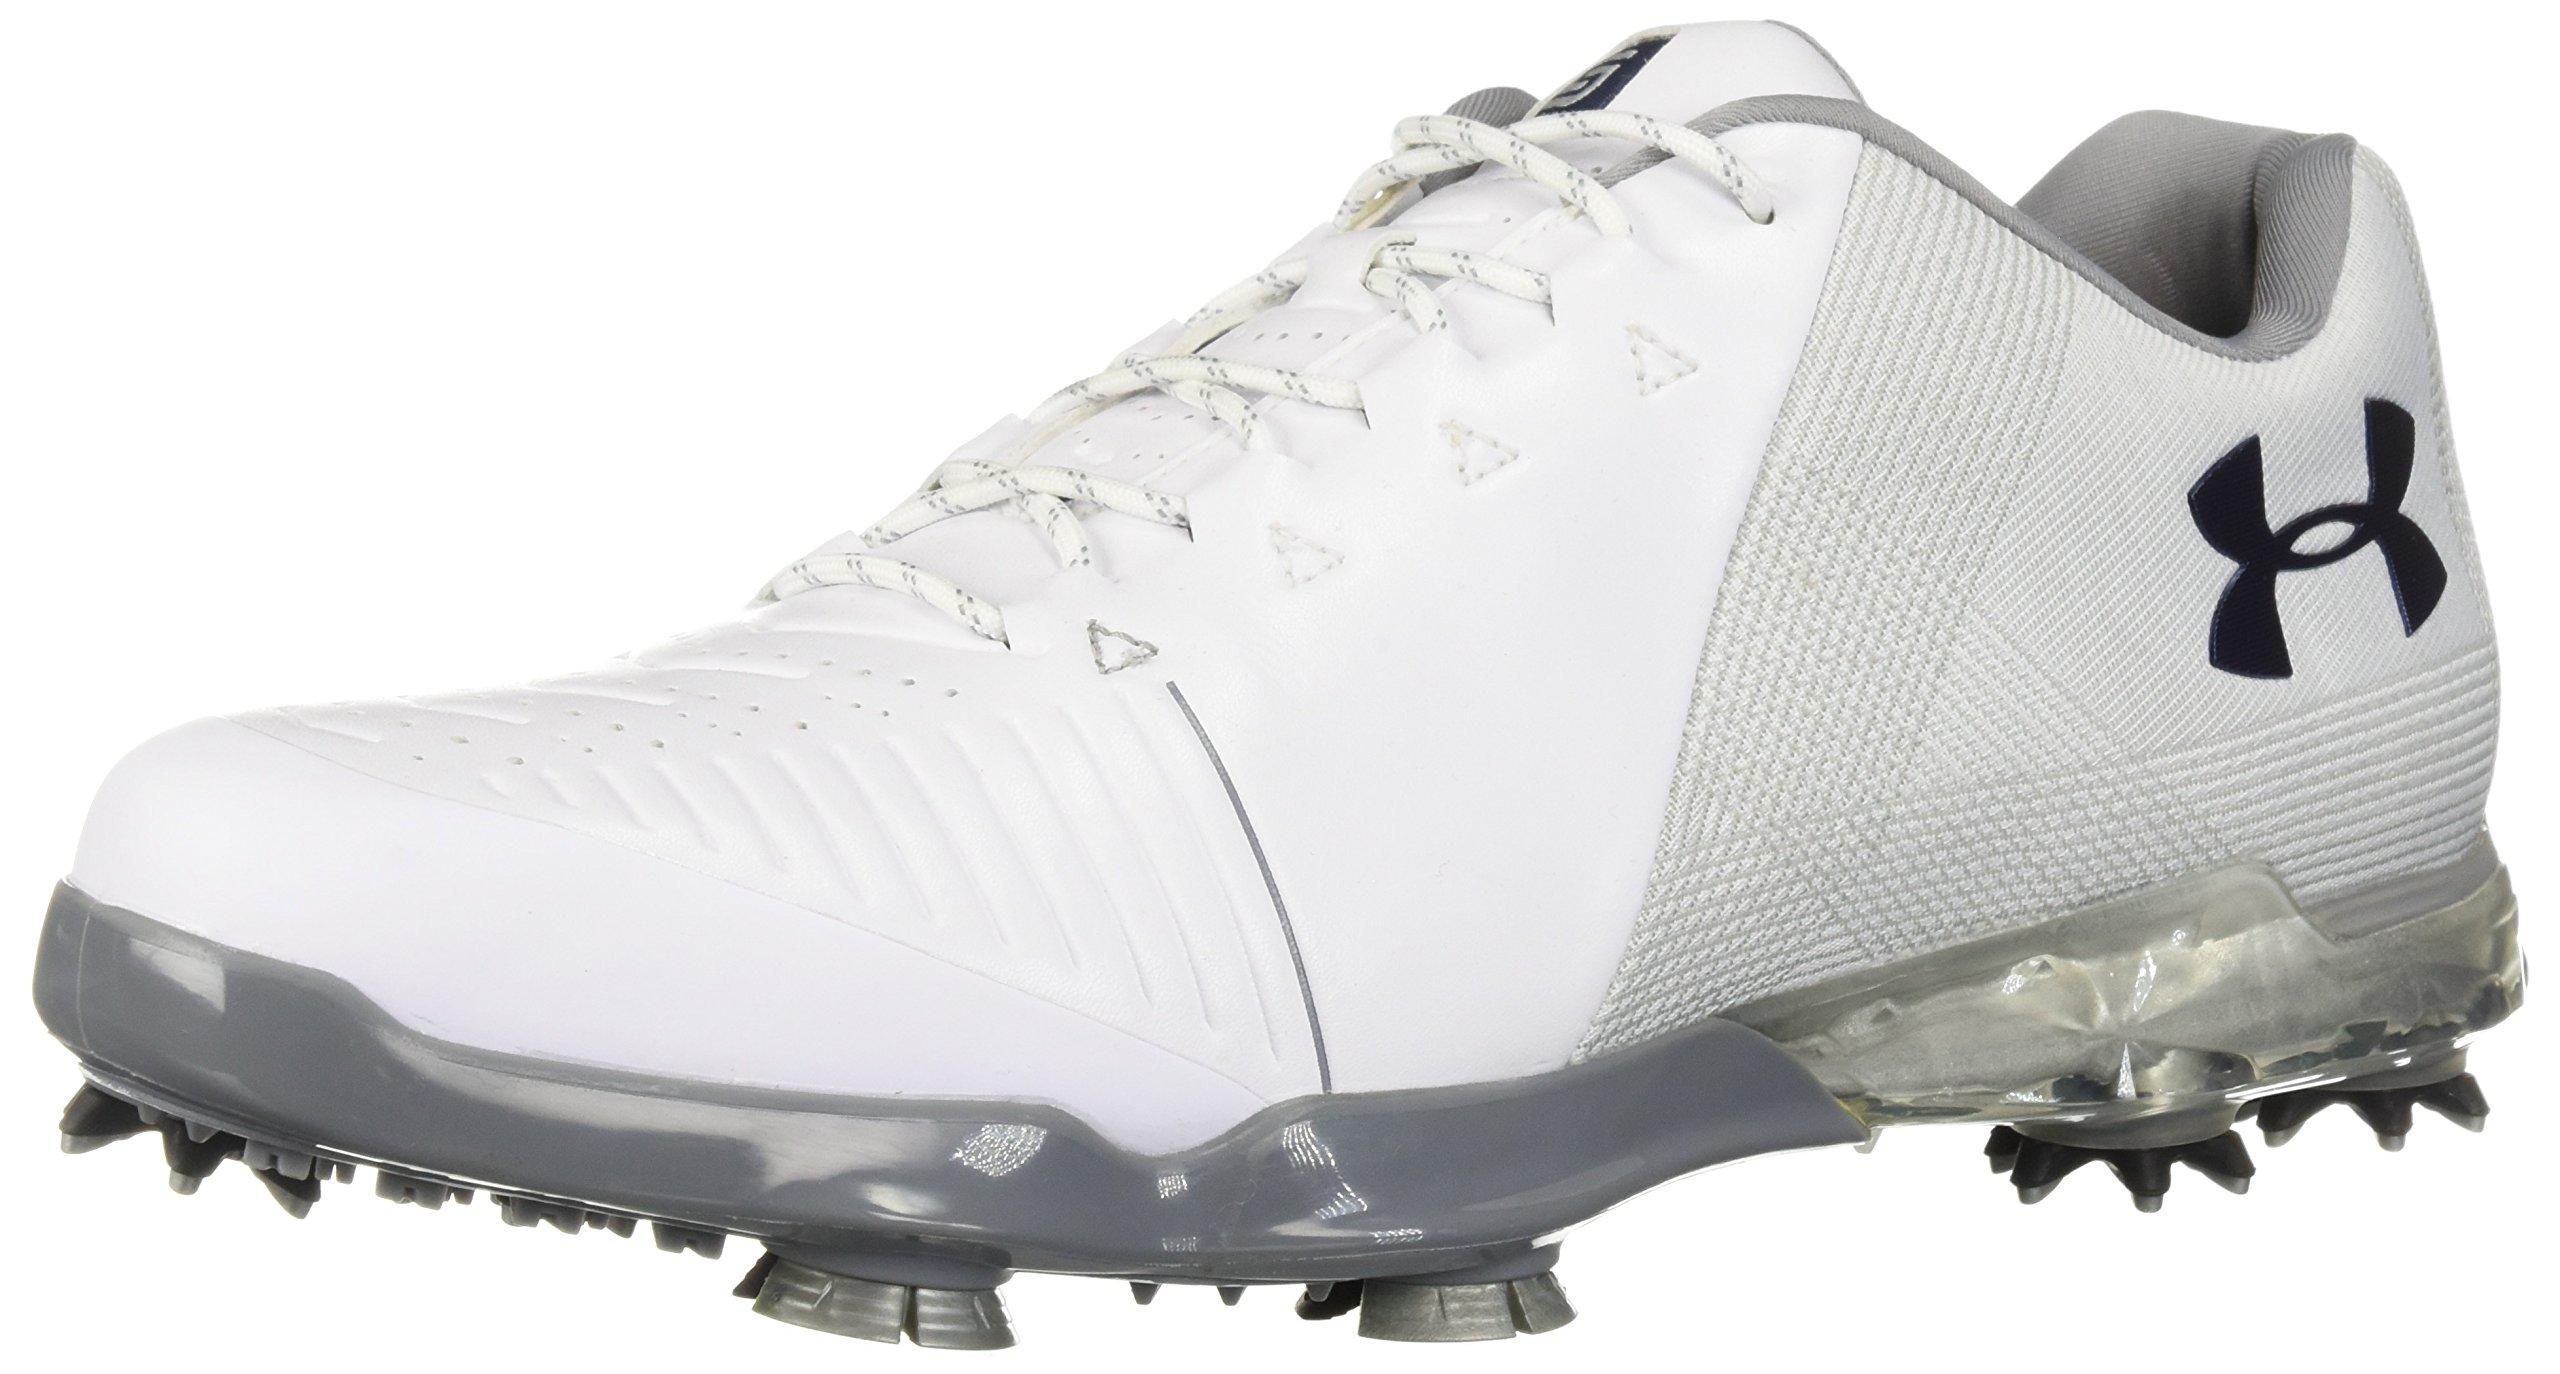 Under Armour Men's Micro G Pursuit Running Shoe Golf, Steel (112)/Black, 9